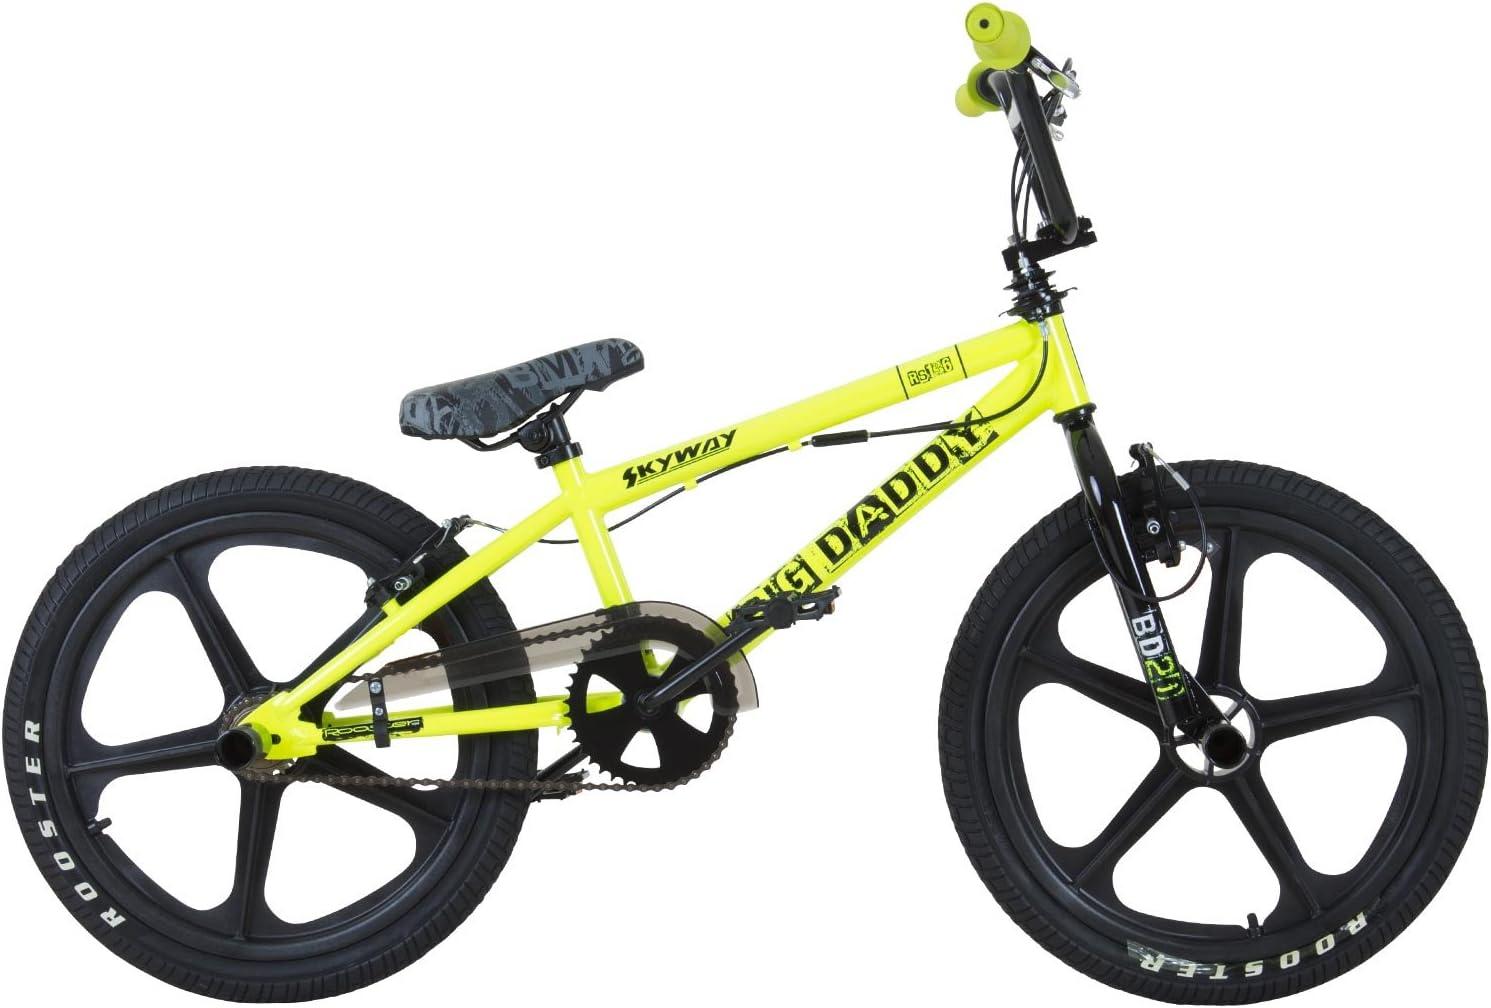 Rooster - Bicicleta BMX Rooster, 20 pulgadas, Big Daddy Skyway ...